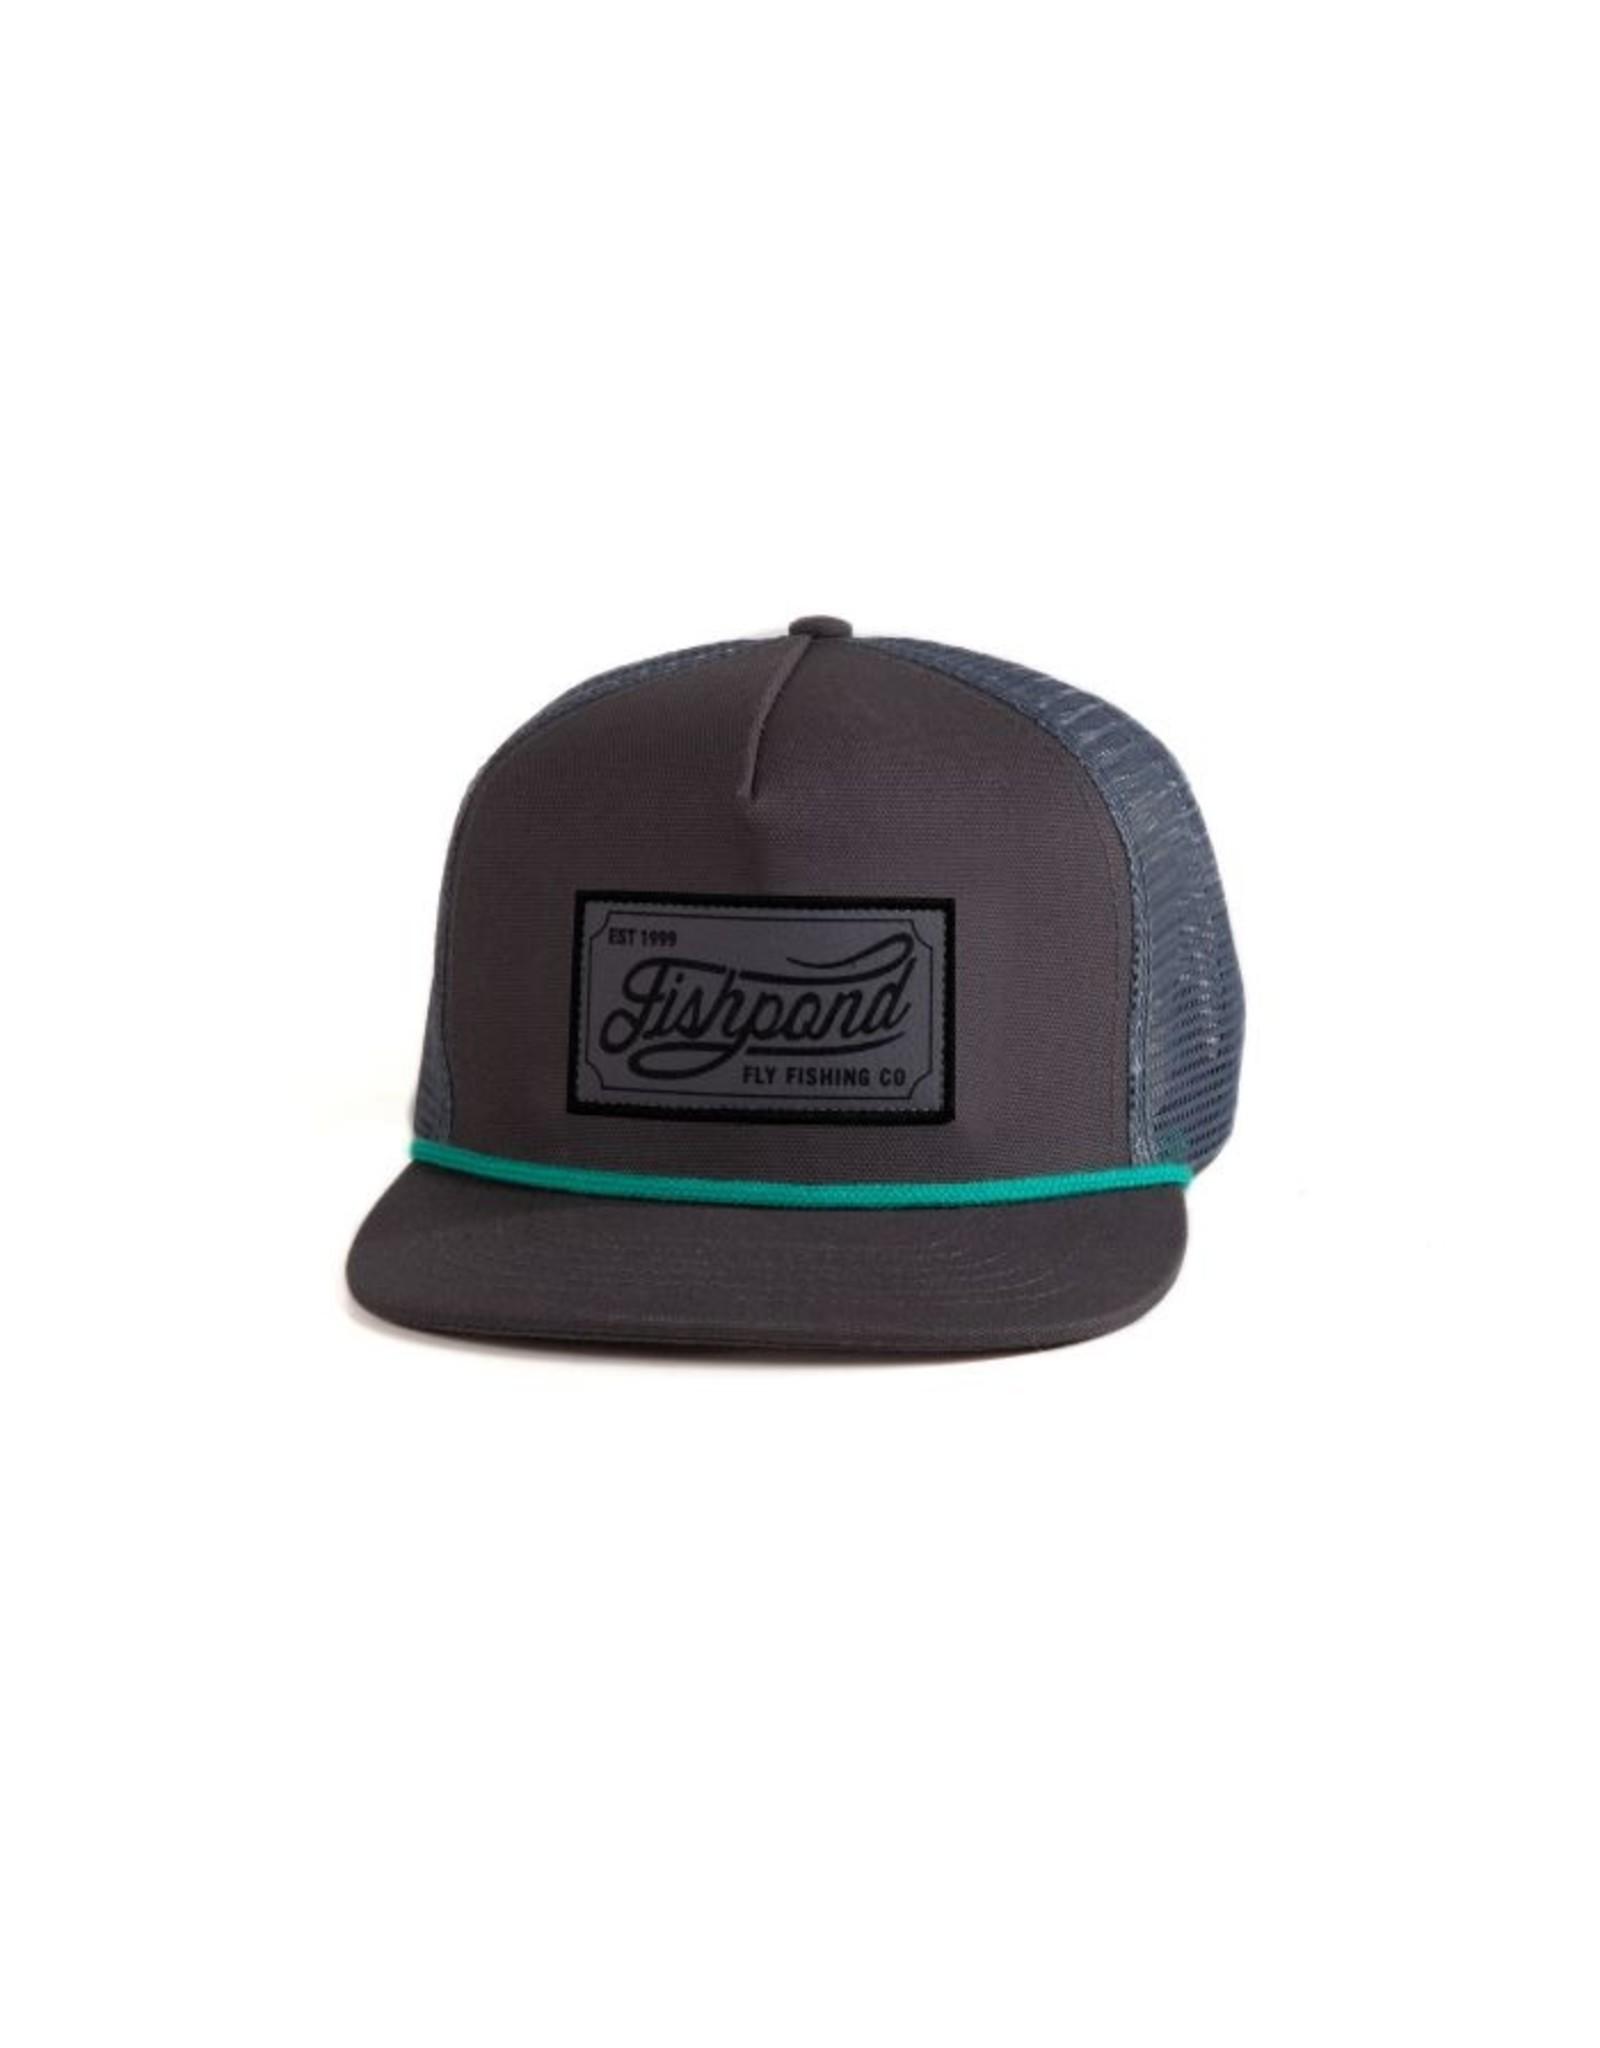 Fishpond Fishpond - Heritage Trucker Hat - Slate